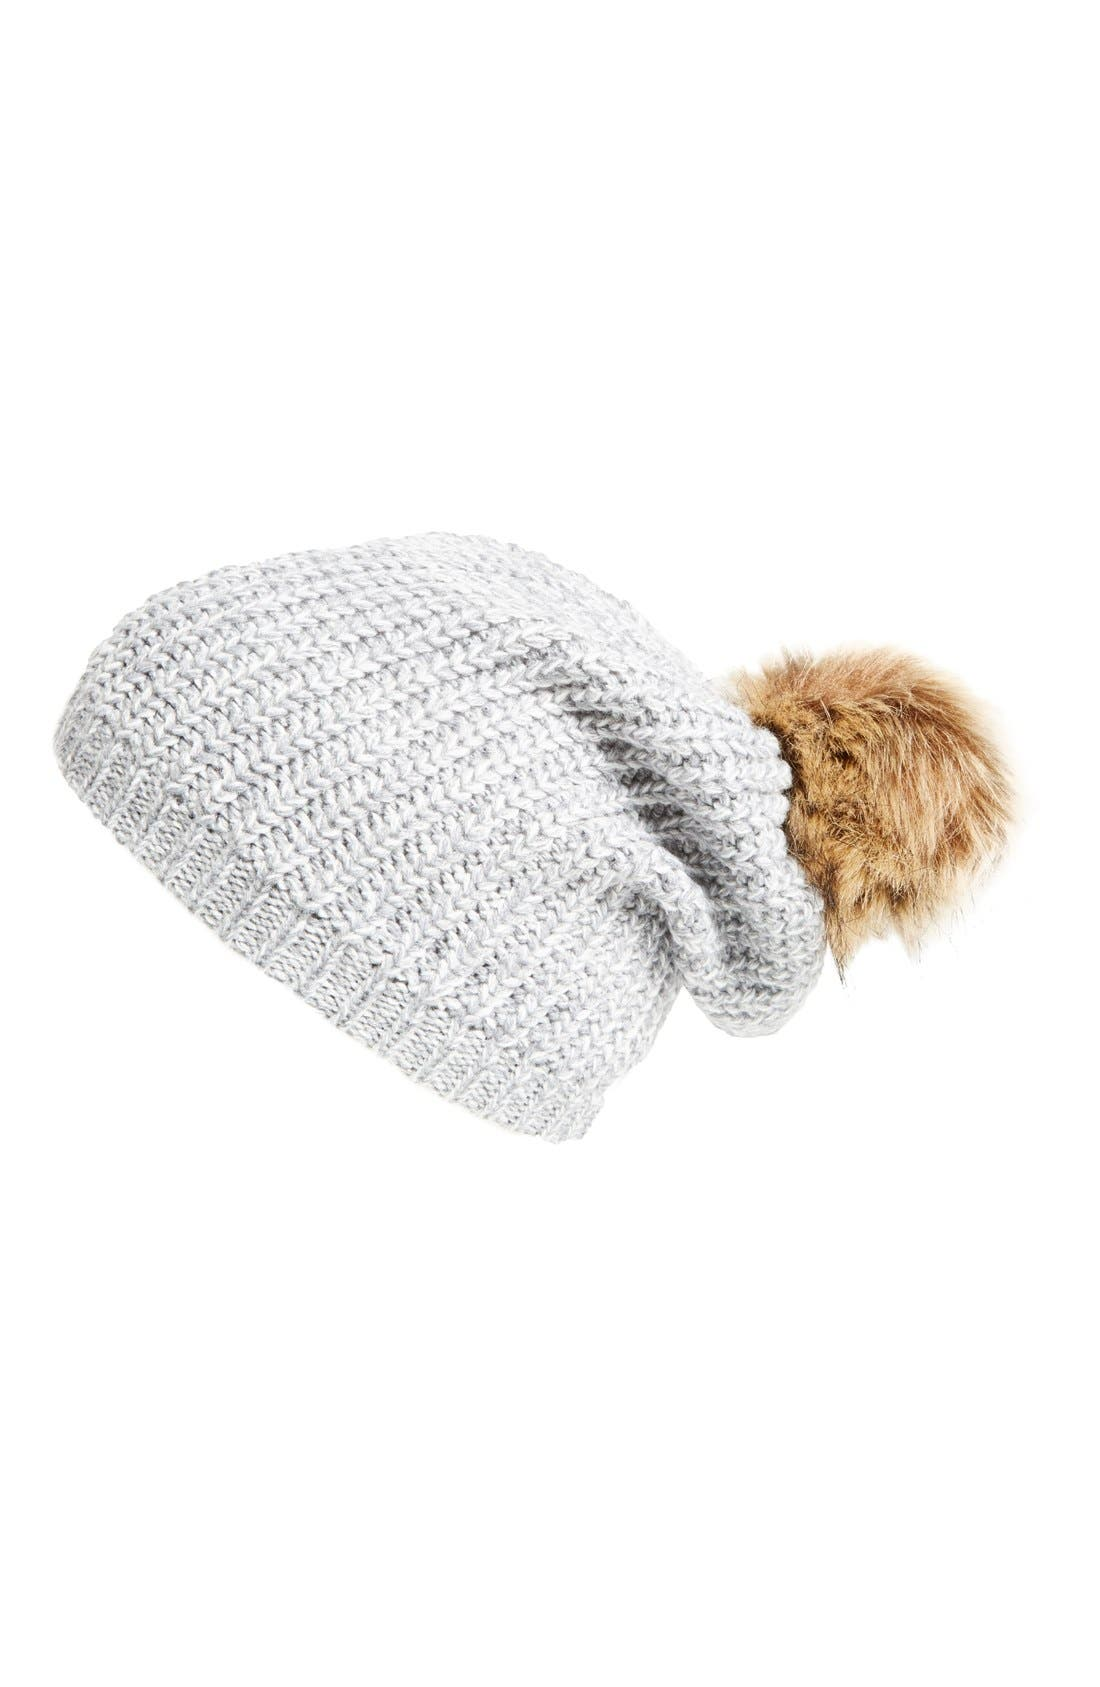 Main Image - Sole Society Pom Knit Beanie